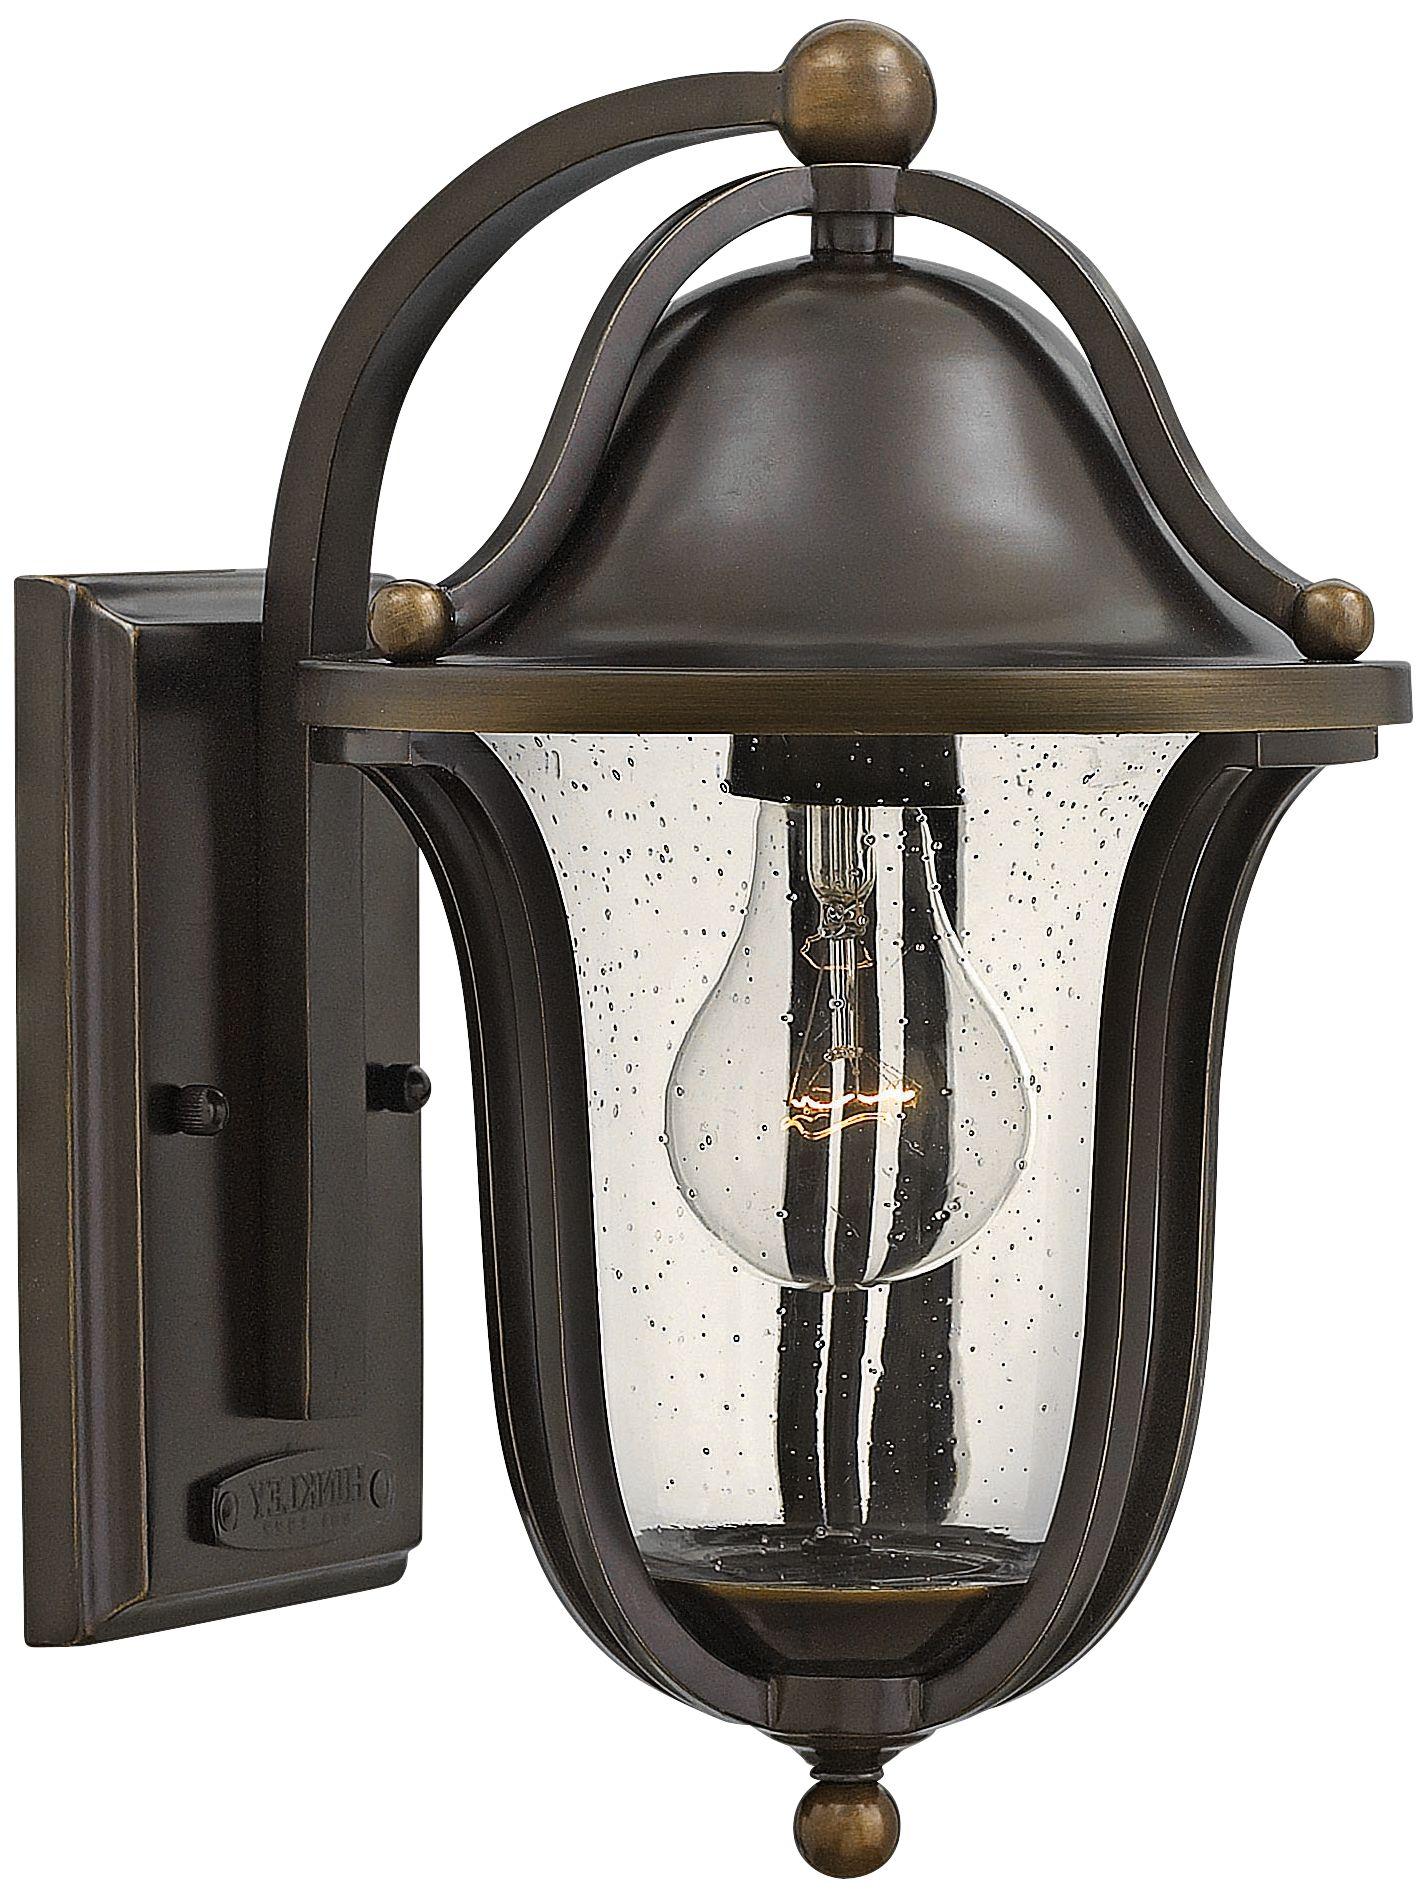 hinkley bolla 7 1 4 wide olde bronze outdoor wall light